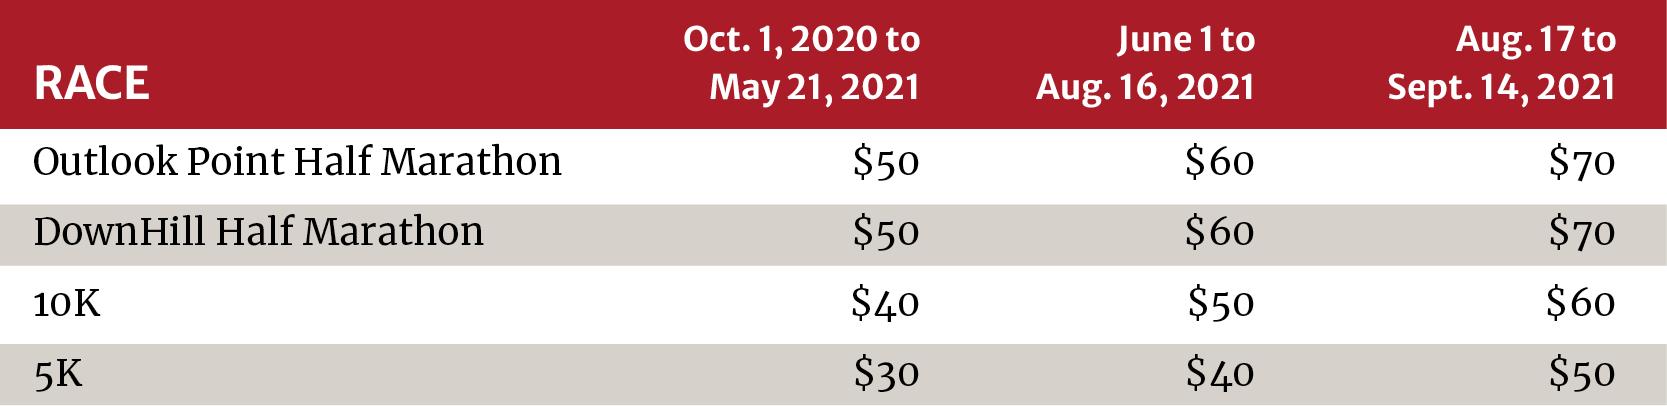 TREK 2021 Registration Table graphic